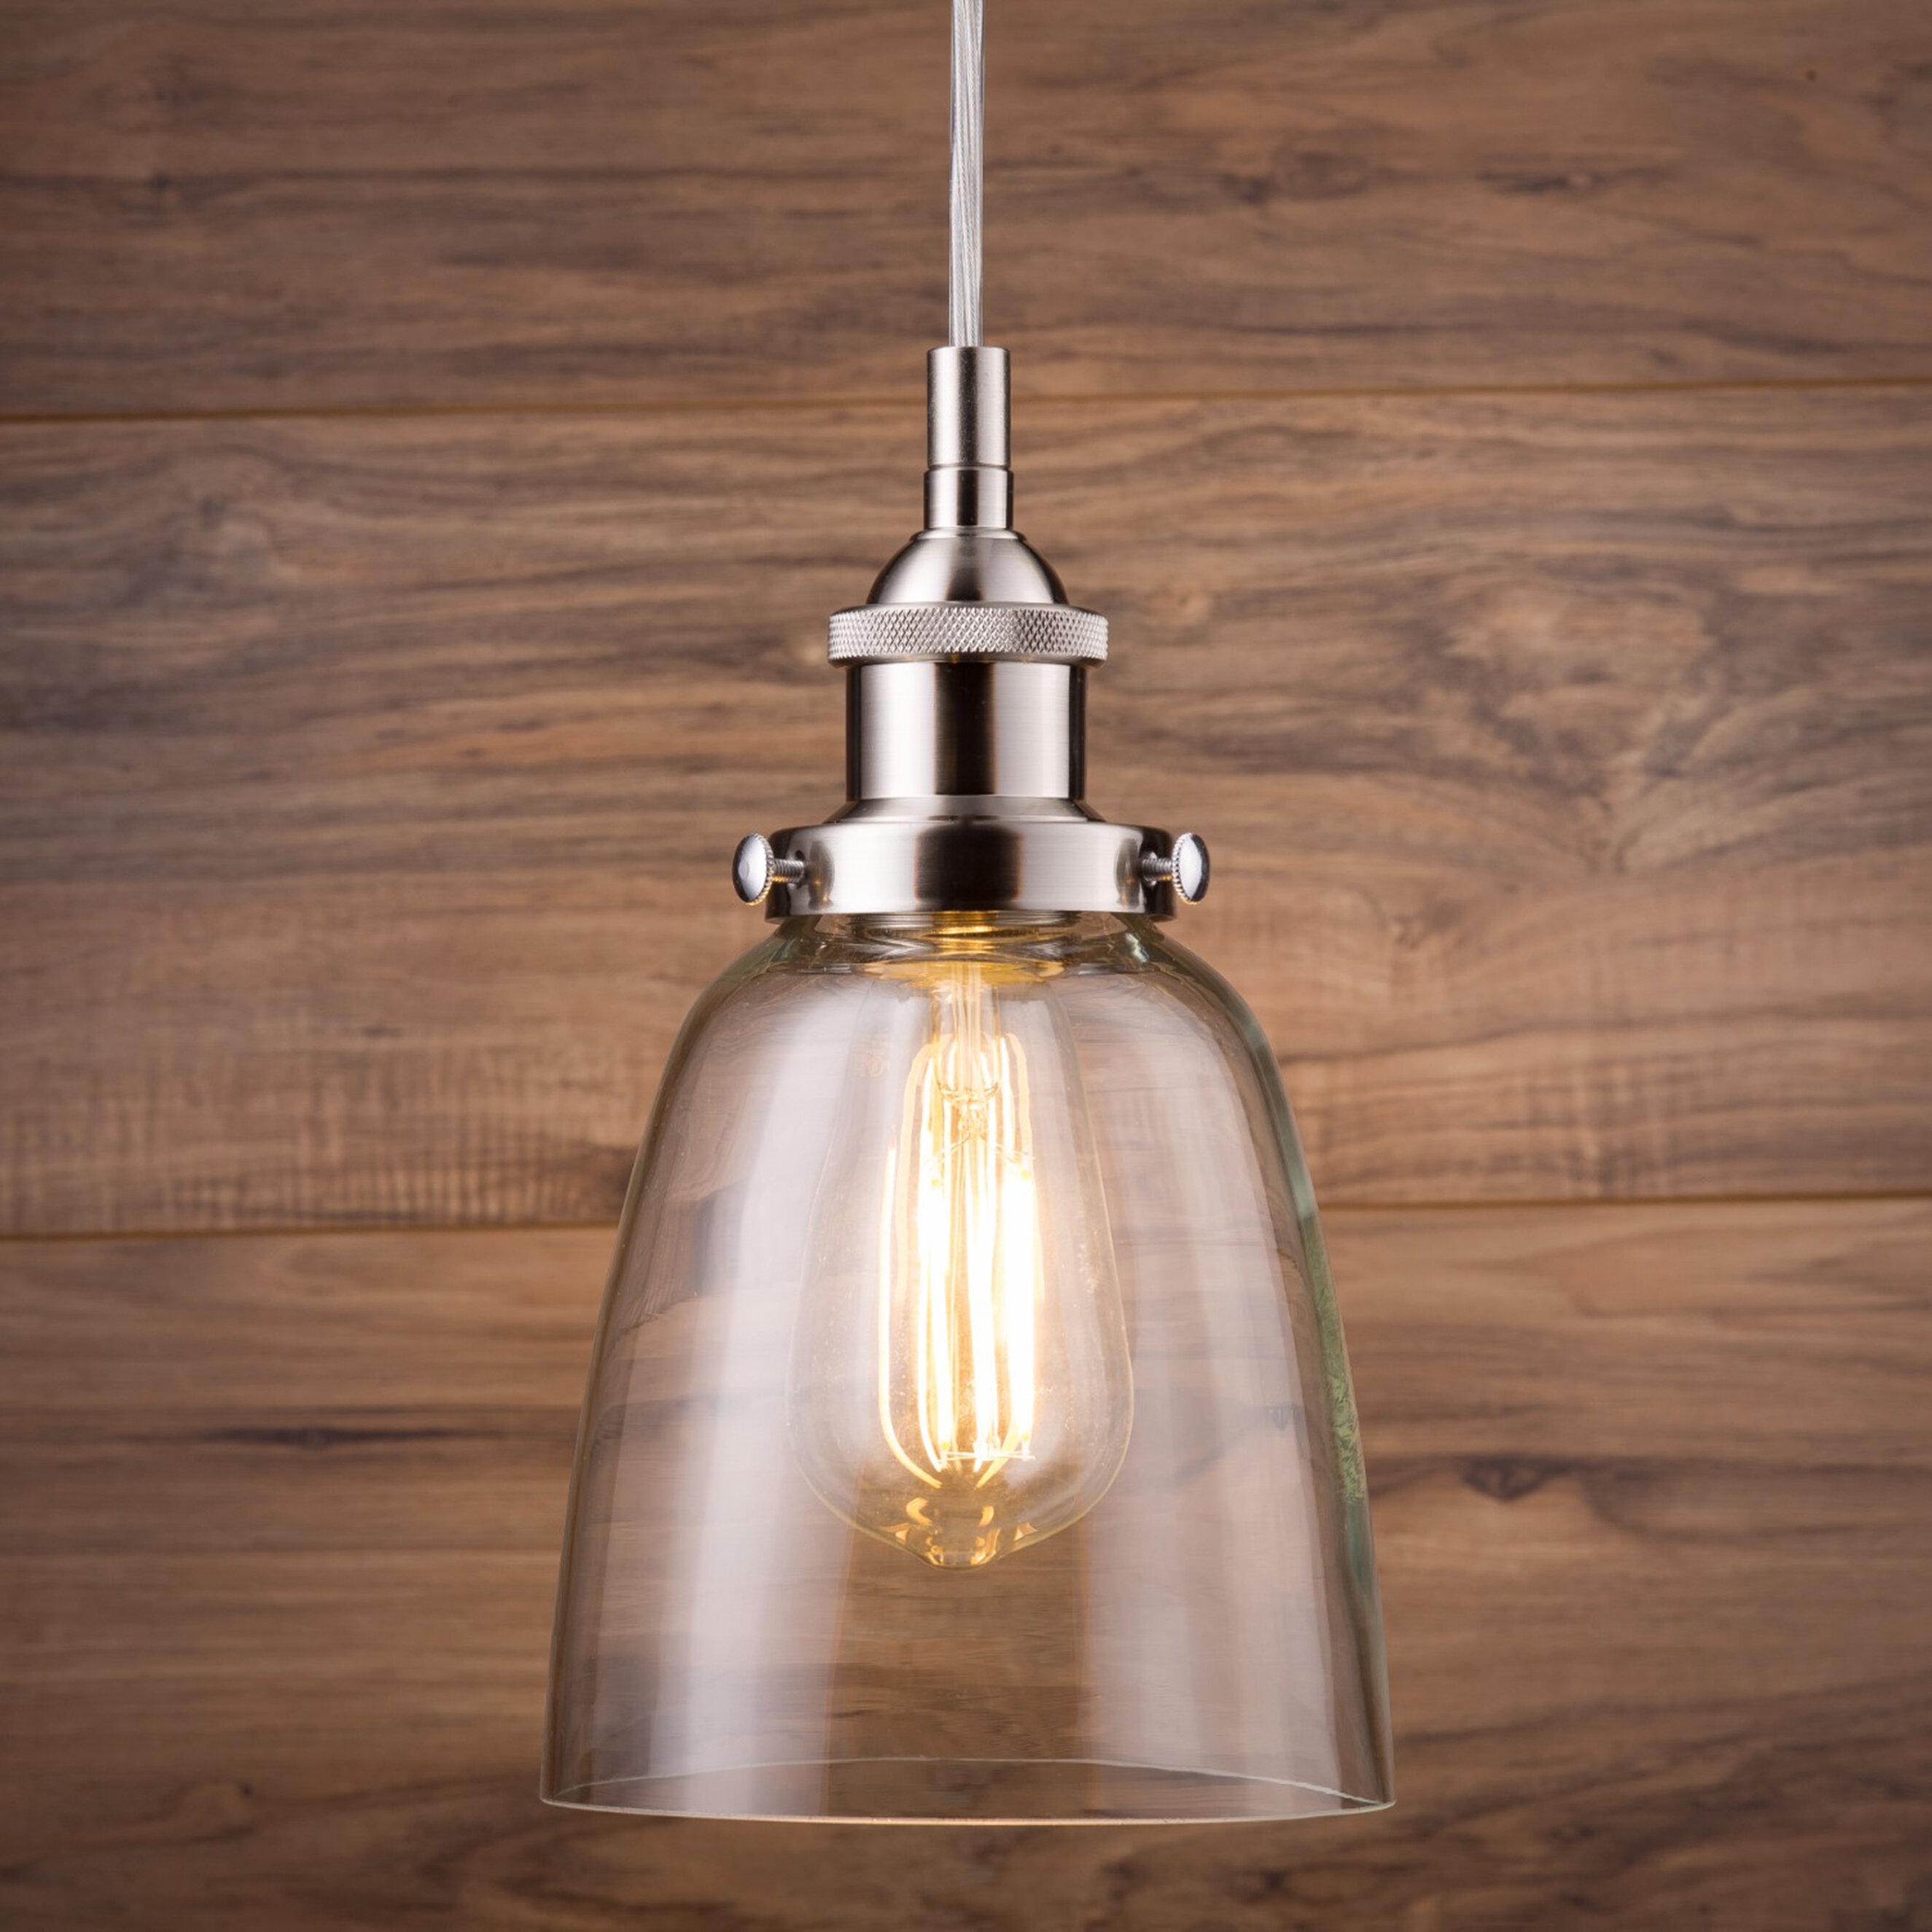 Bundaberg 1 Light Single Bell Pendant For Houon 1 Light Cone Bell Pendants (View 12 of 30)